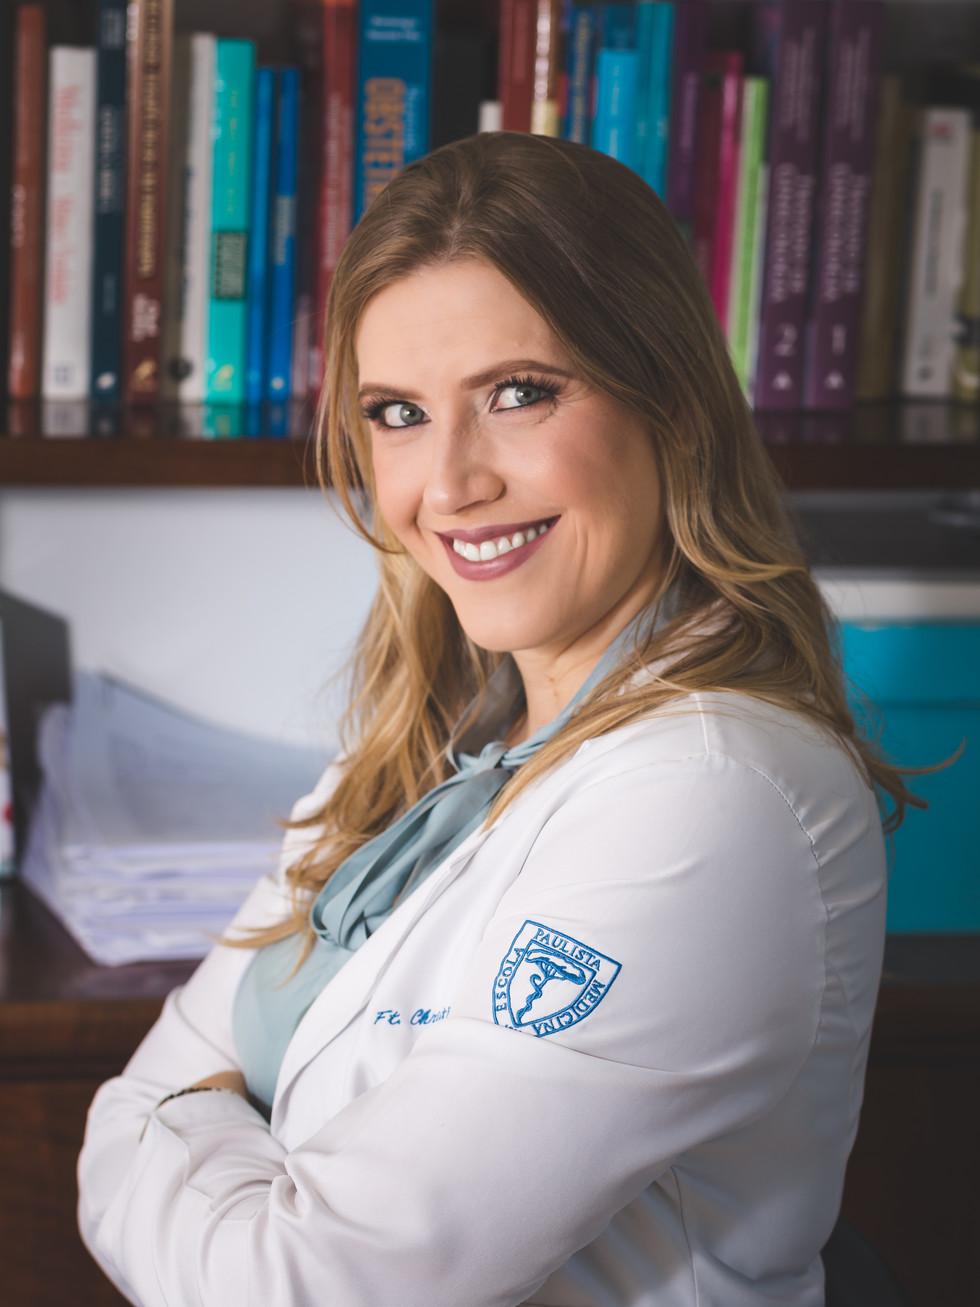 fotografia perfil medico